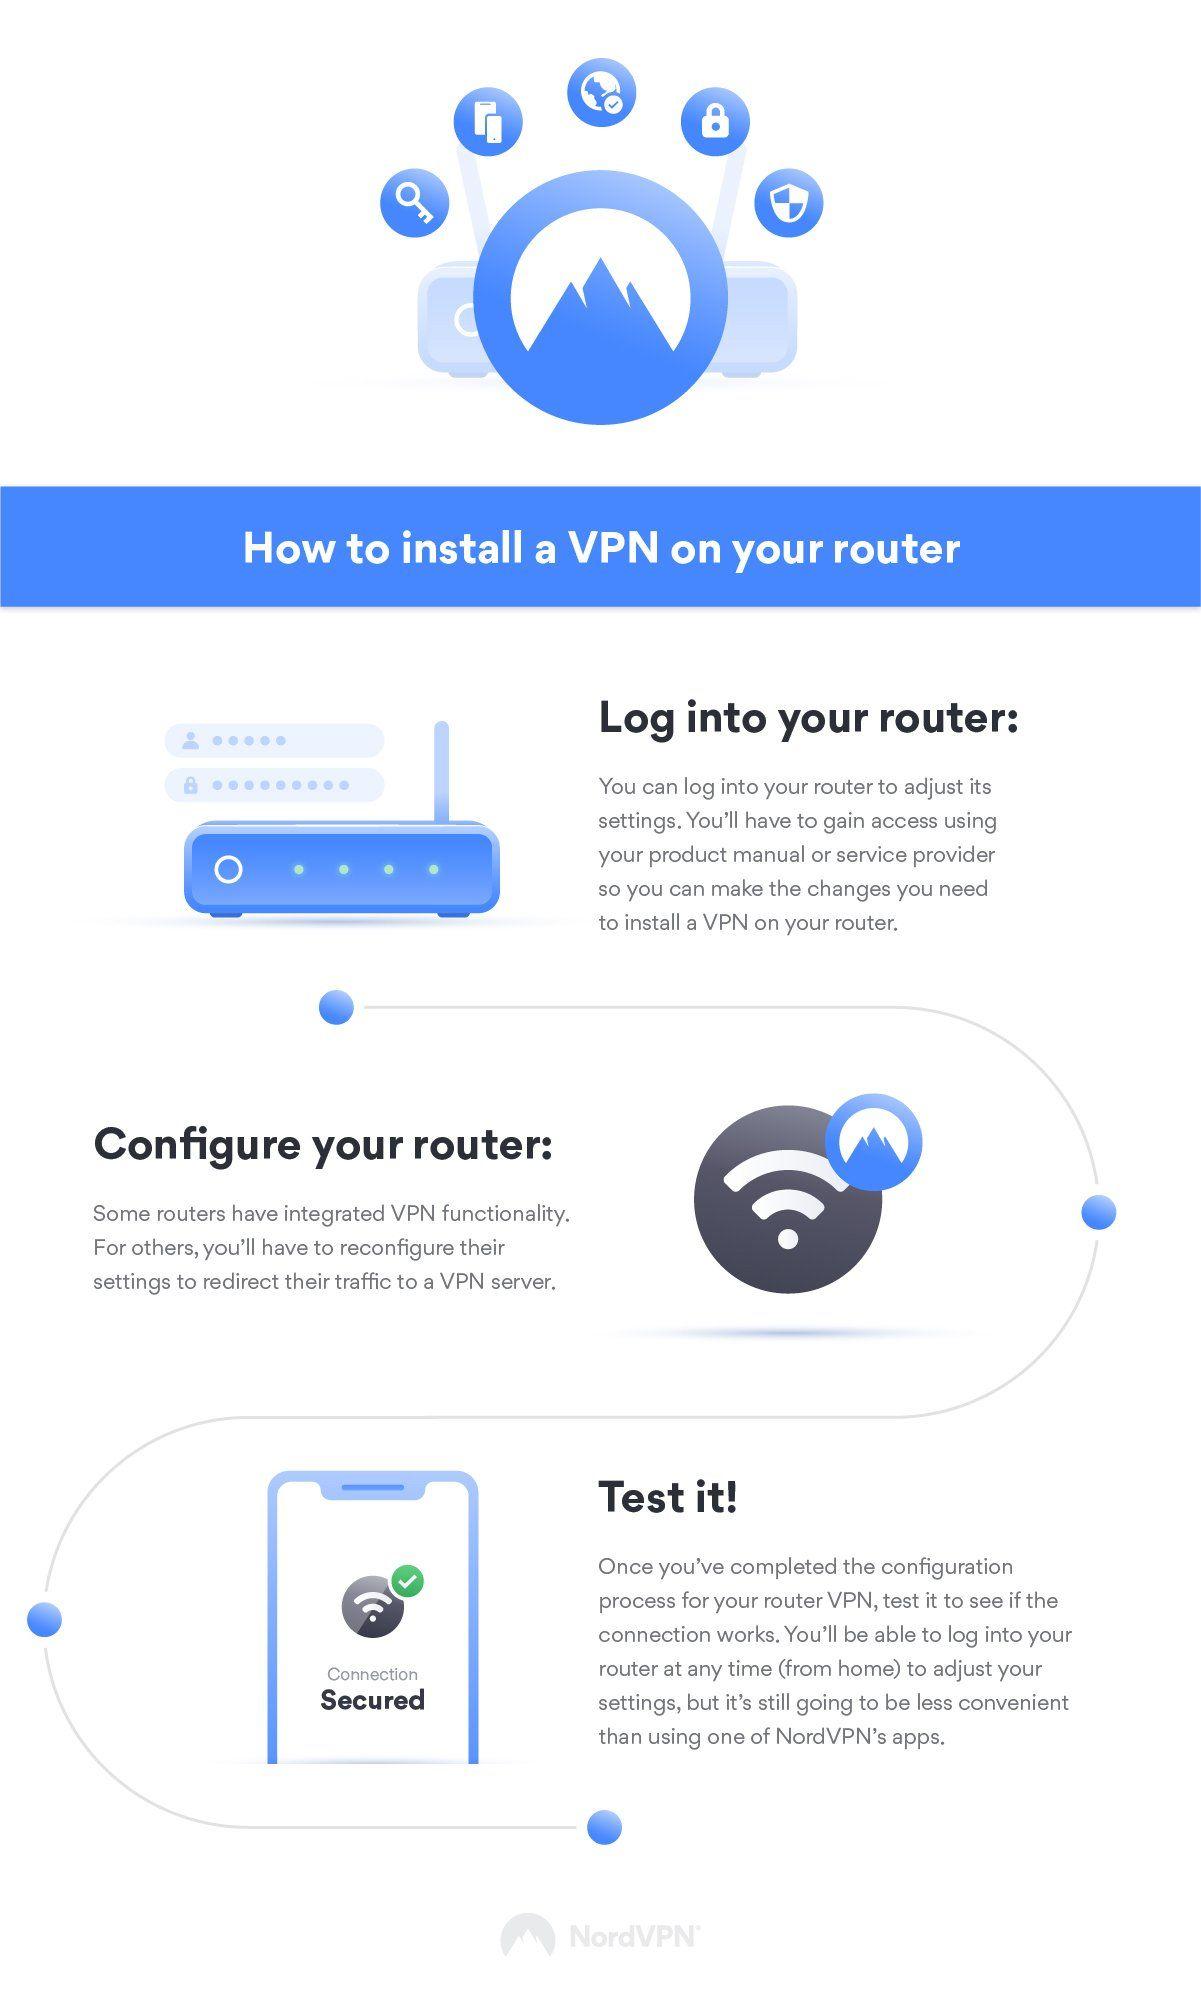 287adb54157b8b474b0fb62f126cc71d - Can You Setup Vpn On Router